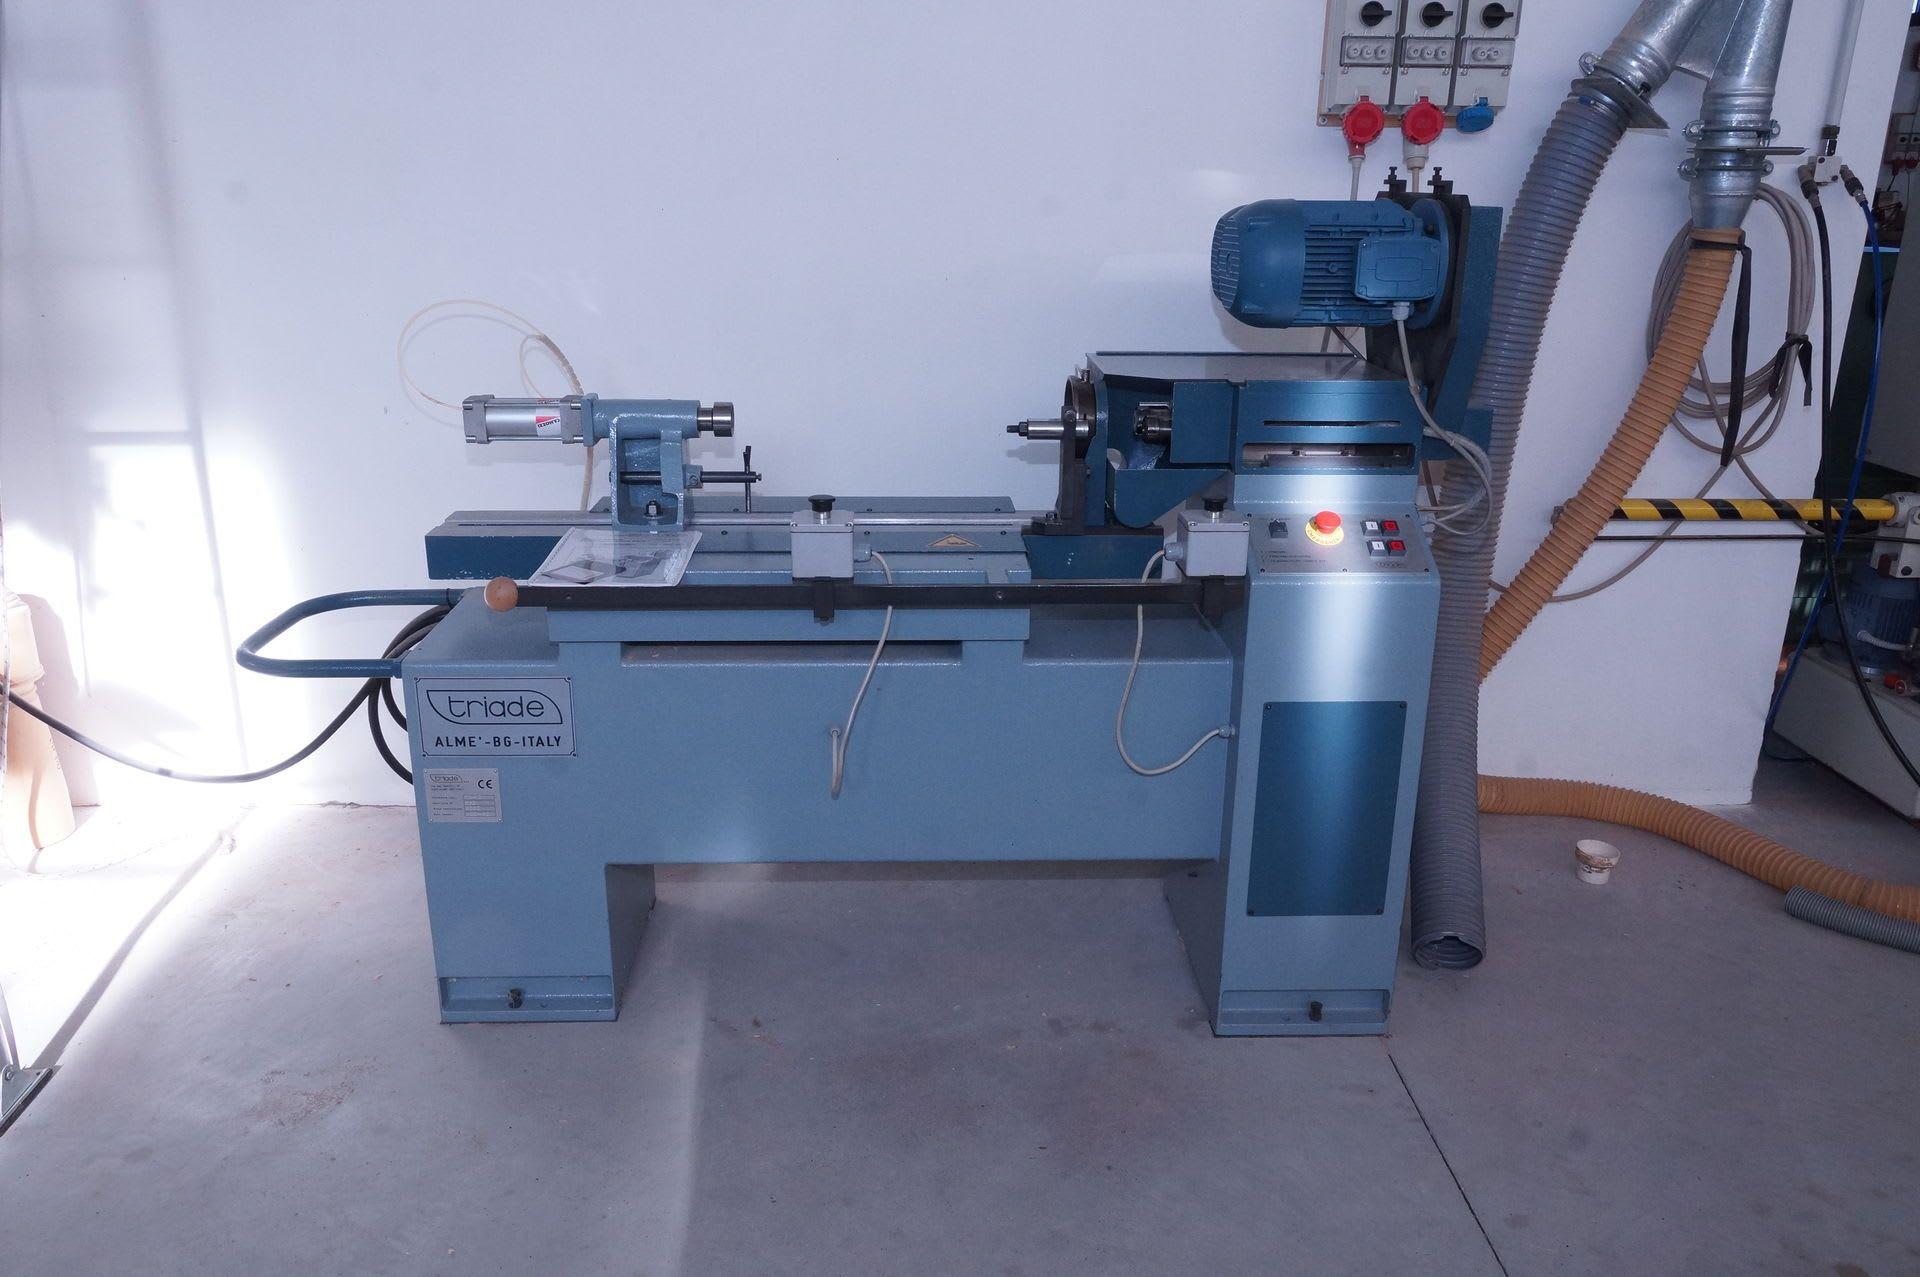 TRIADE FA-2 Automatische Schraub-/Bohrmaschine